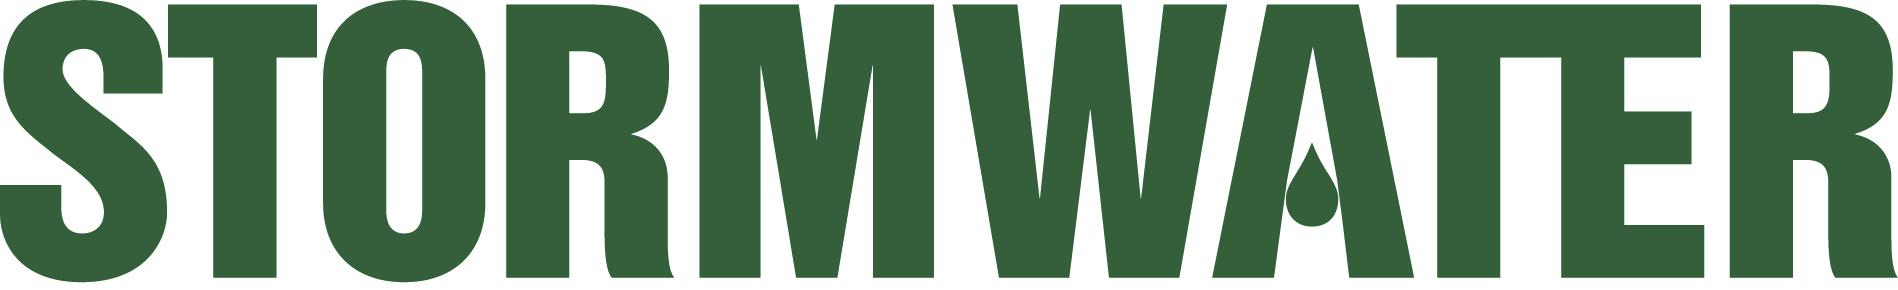 Stormwater Green Logo No Tagline